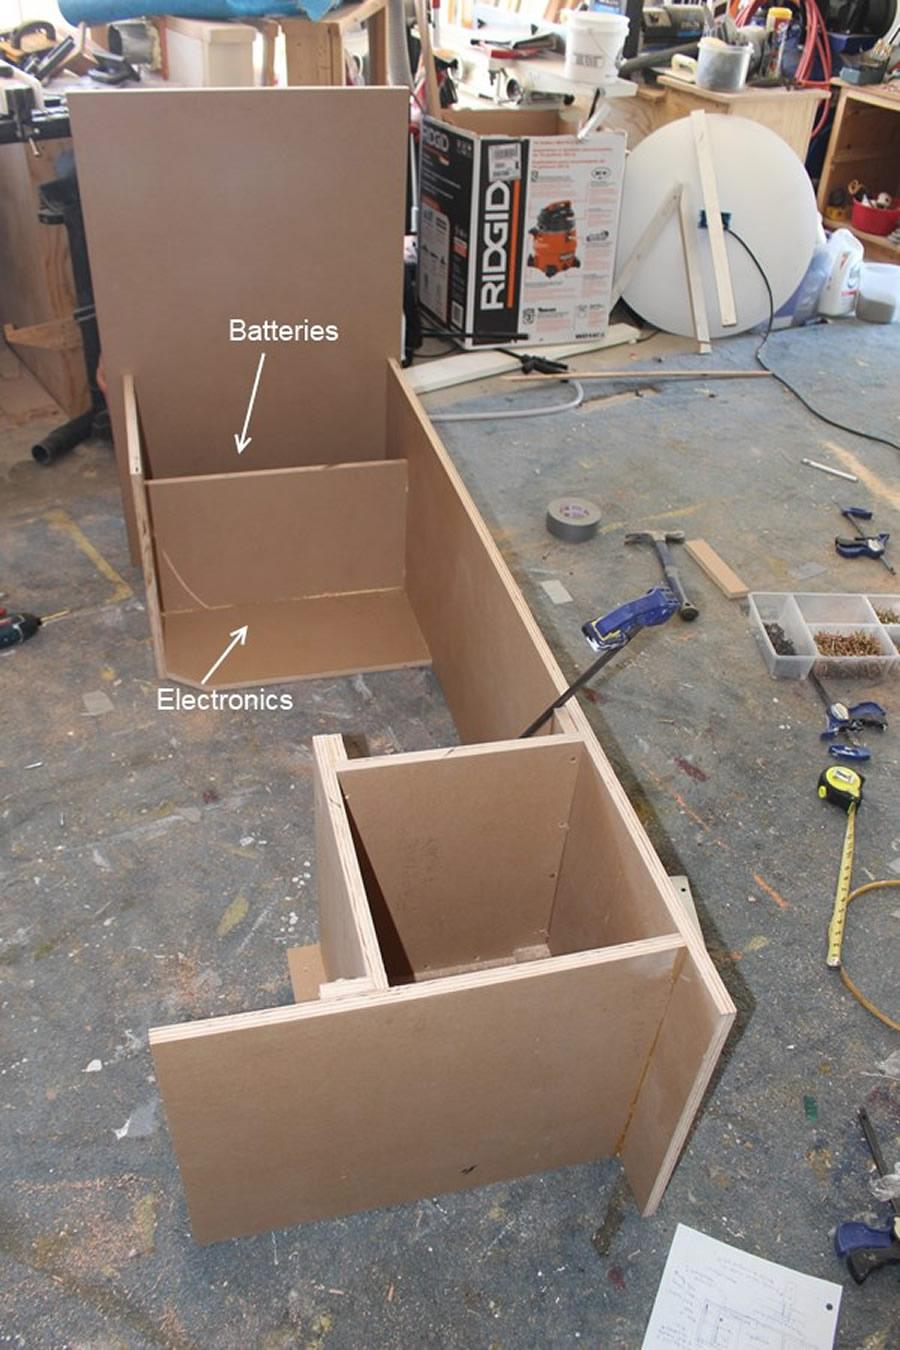 electronics and propane box